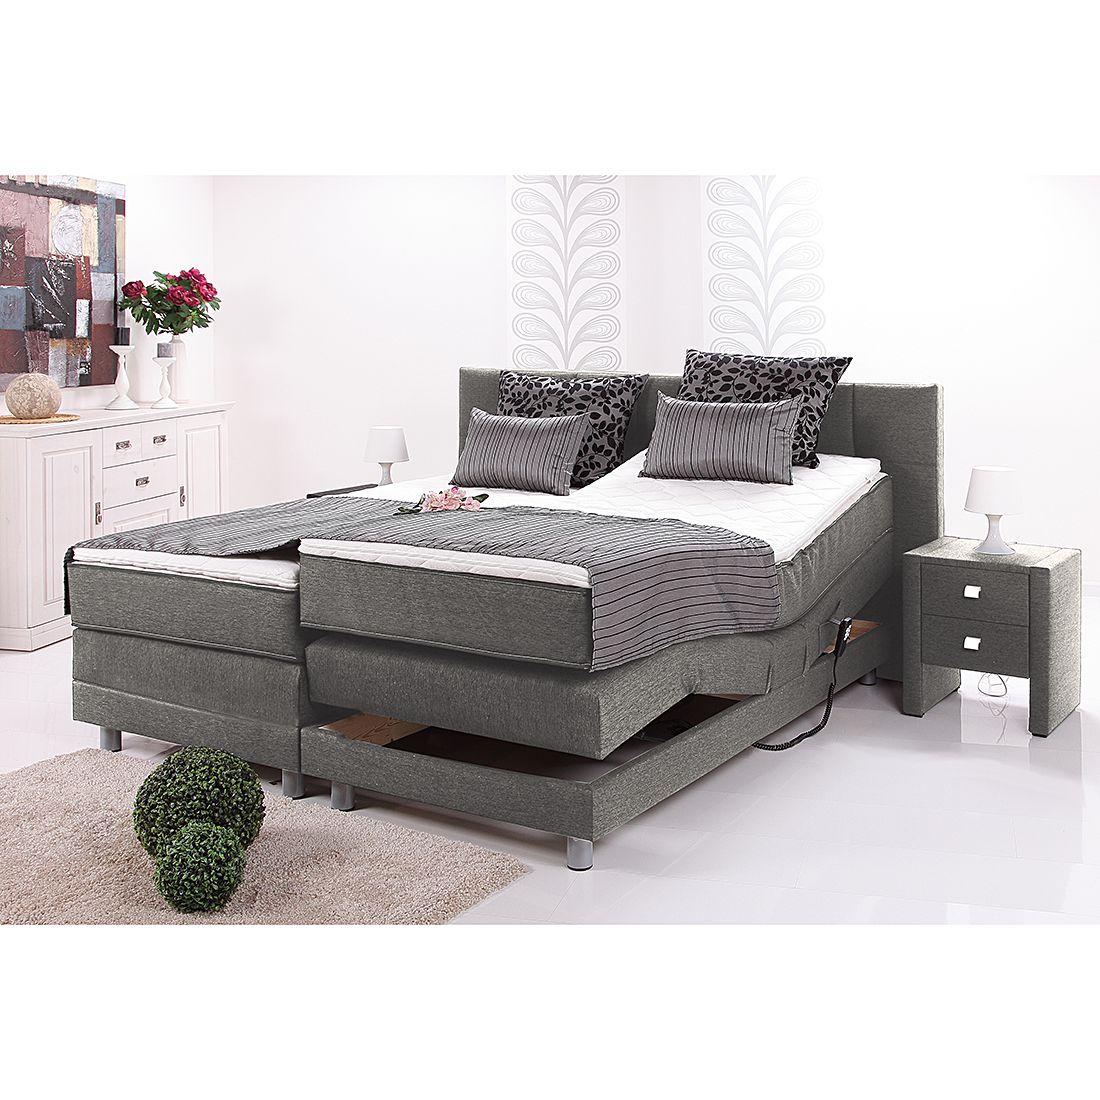 40 sparen boxspringbett kendrick von breckle 180x200cm. Black Bedroom Furniture Sets. Home Design Ideas